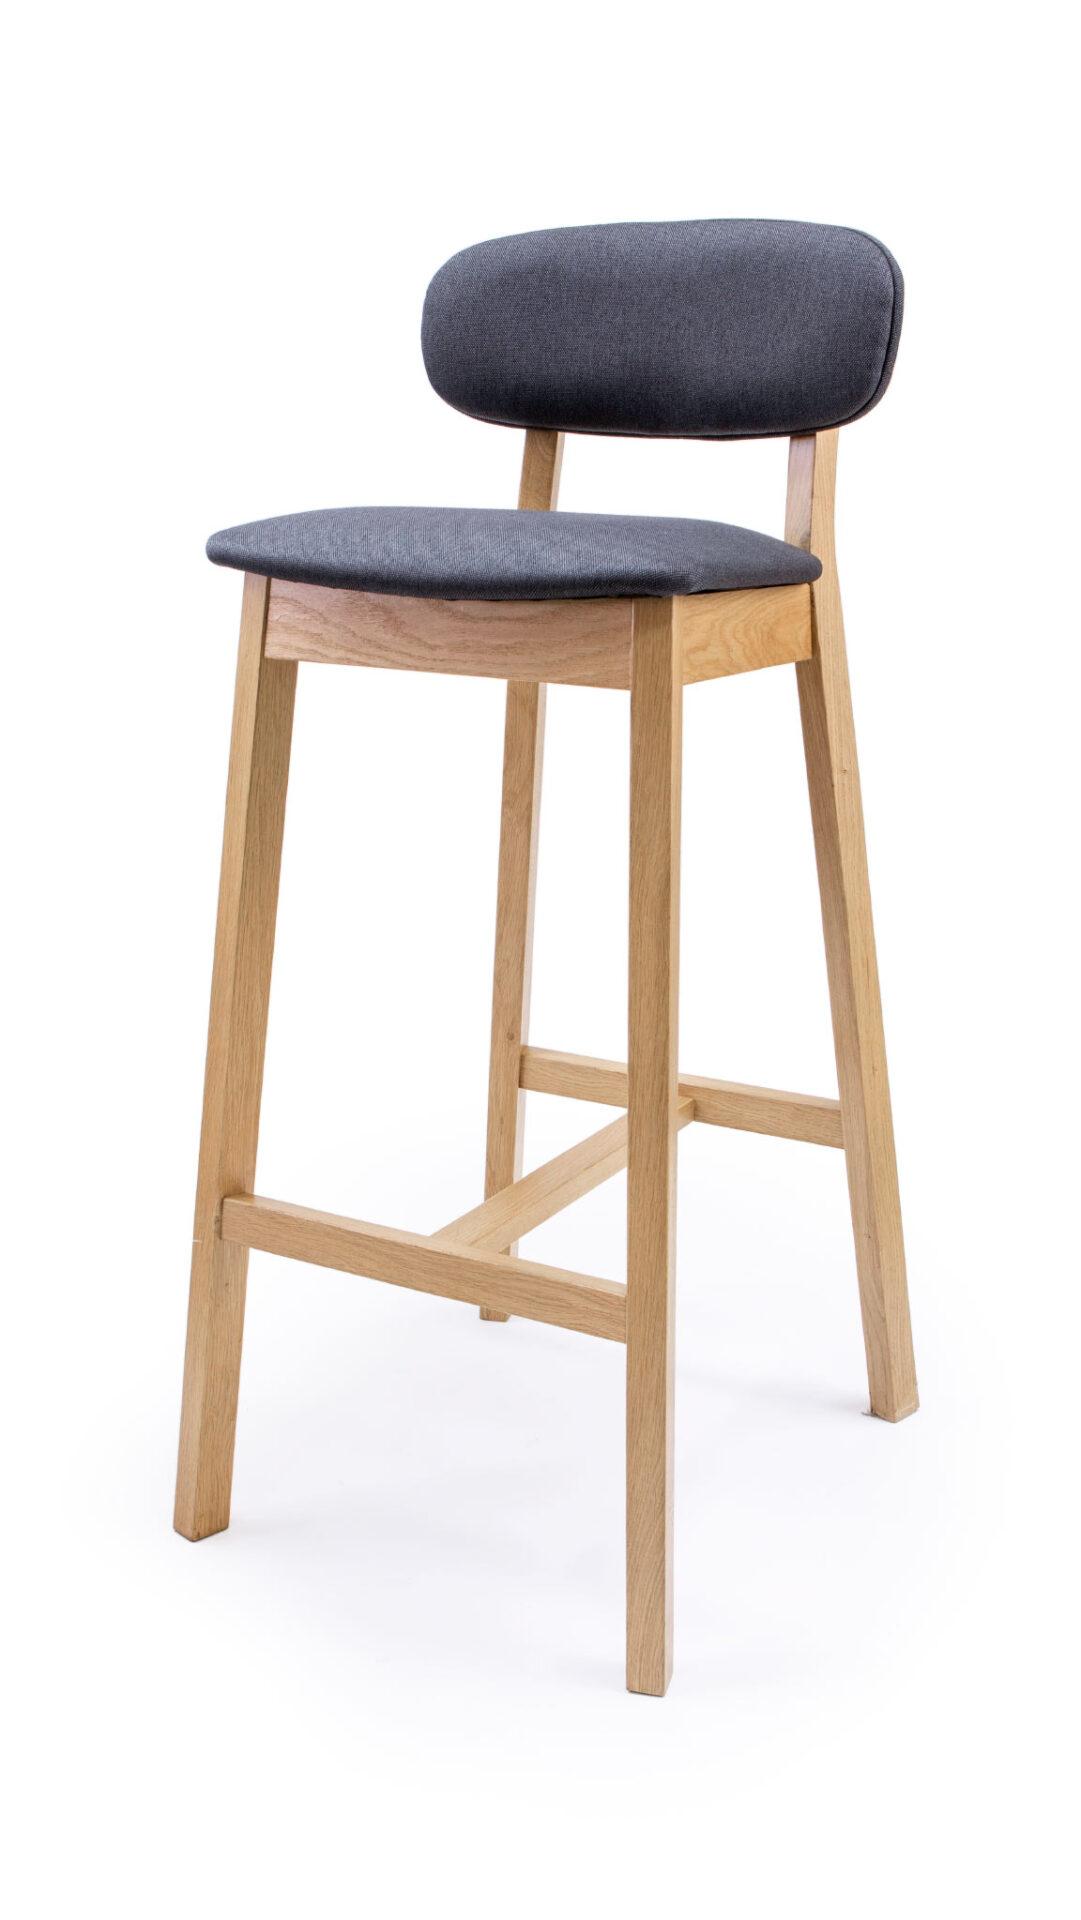 Solid Wood bar stool made of Beech or Oak - 1370B